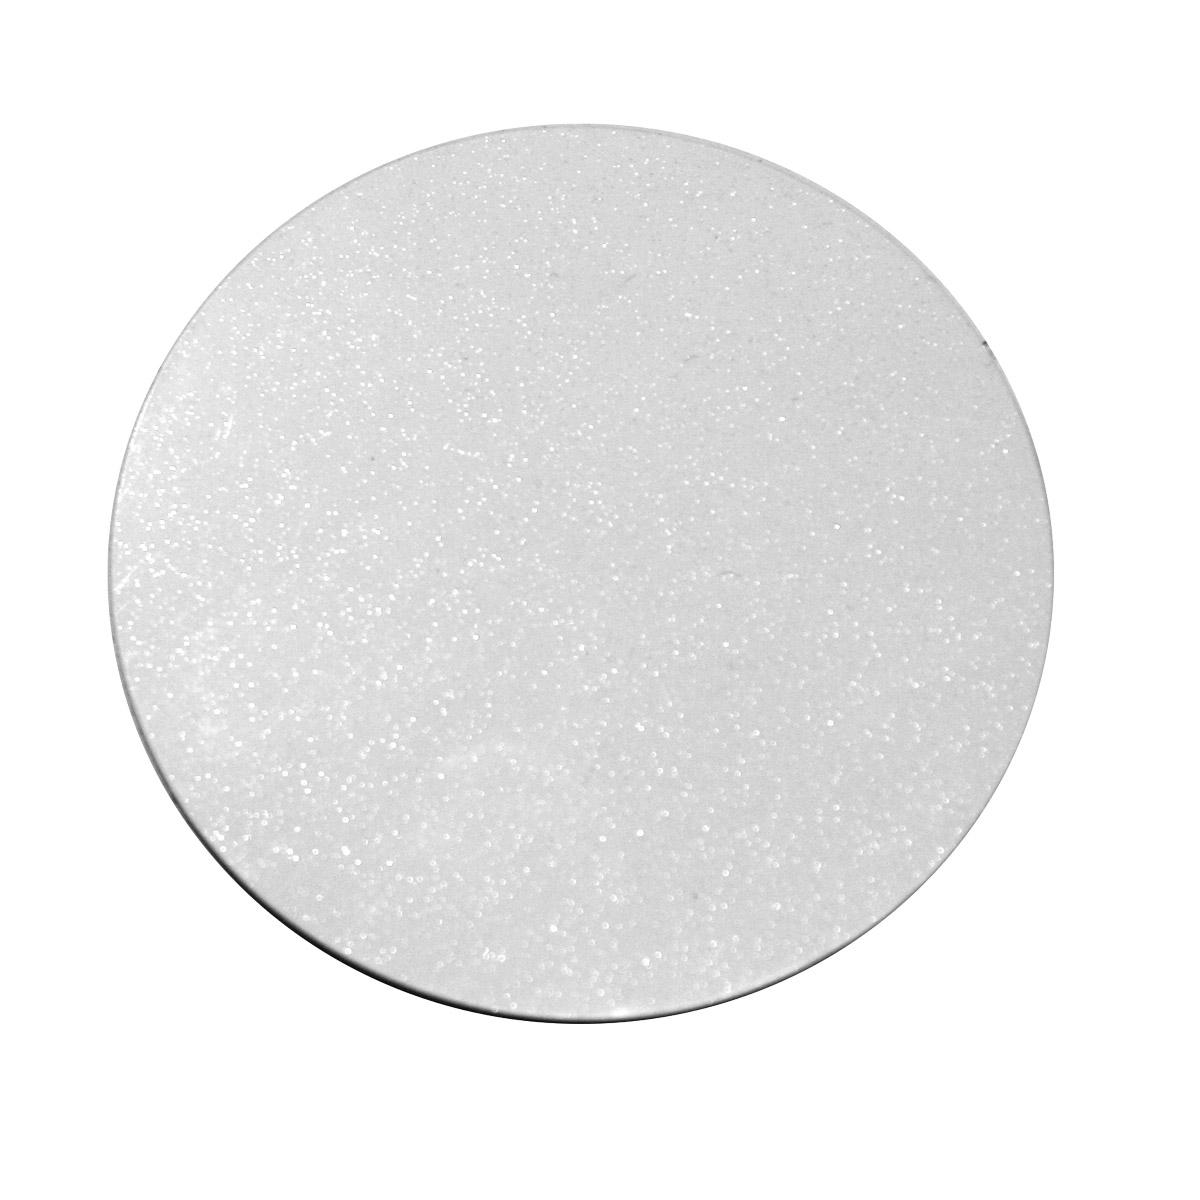 Fridge magnet for sublimation - round - 25 pieces